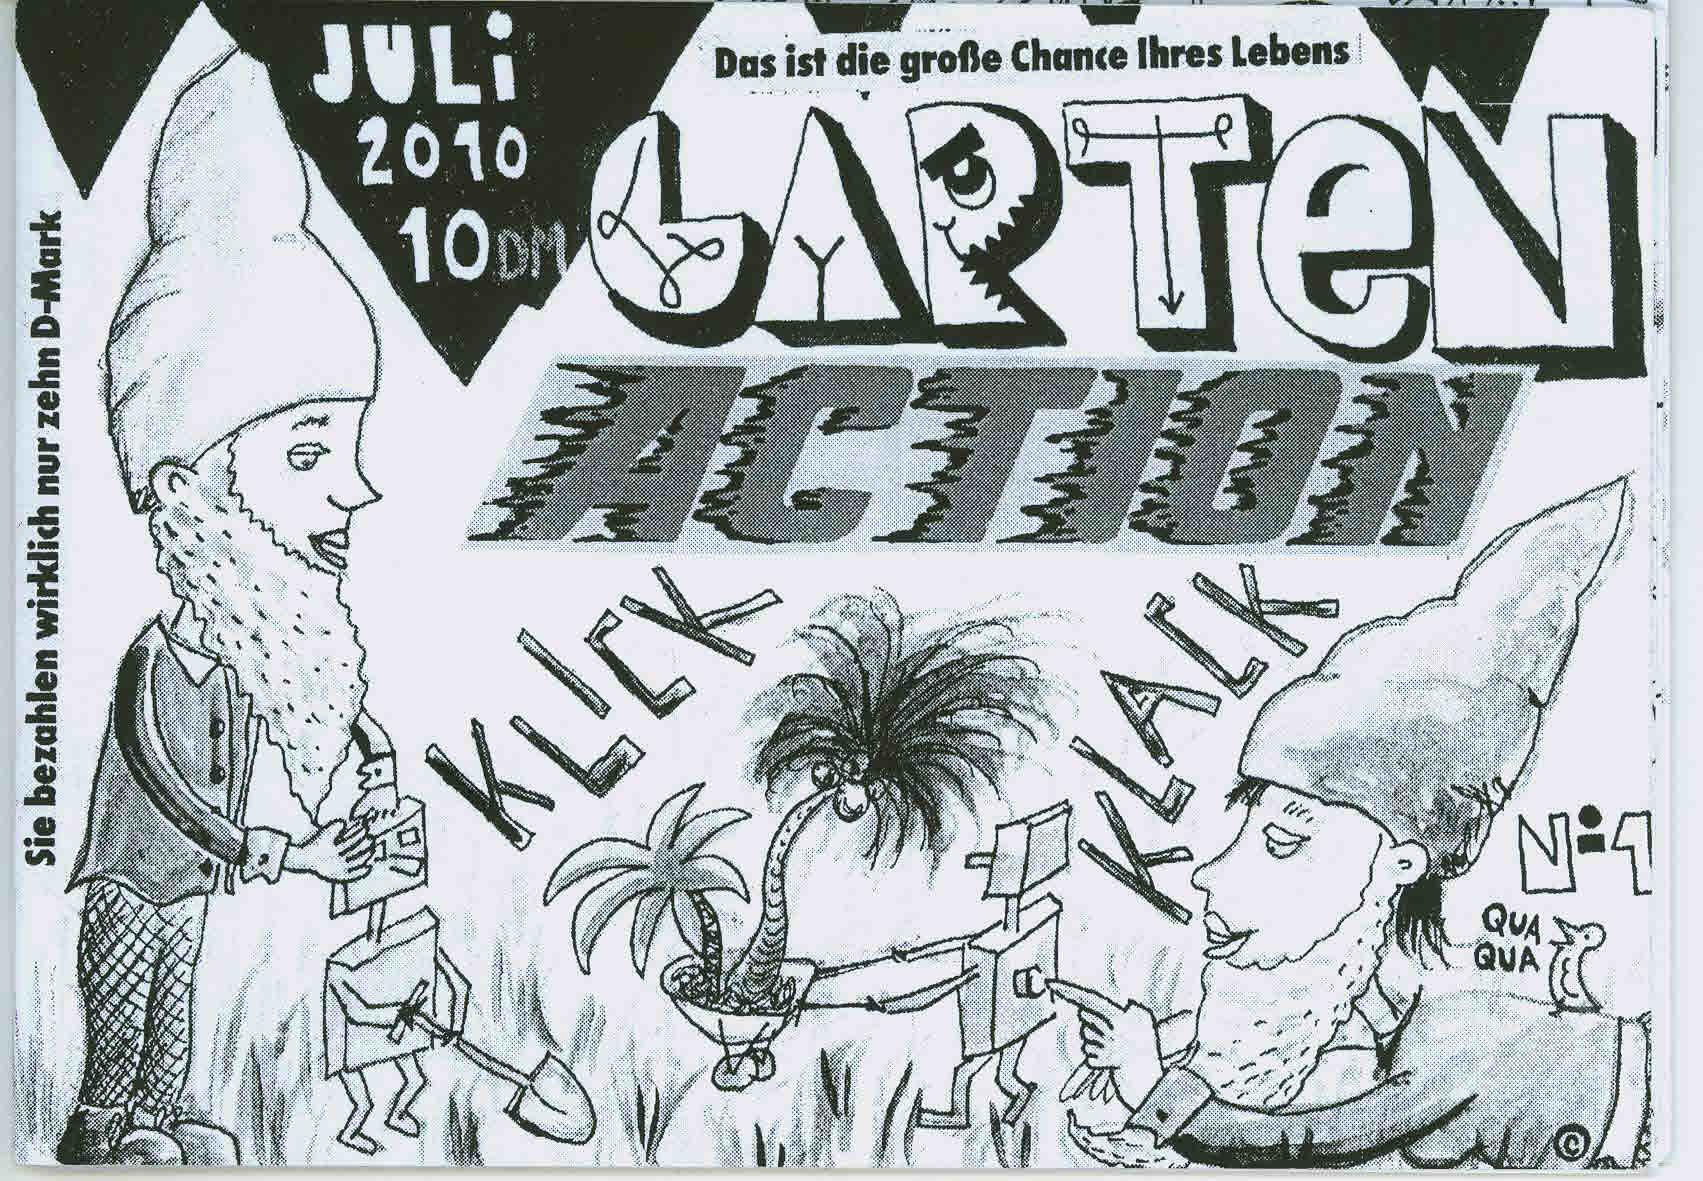 Carten action